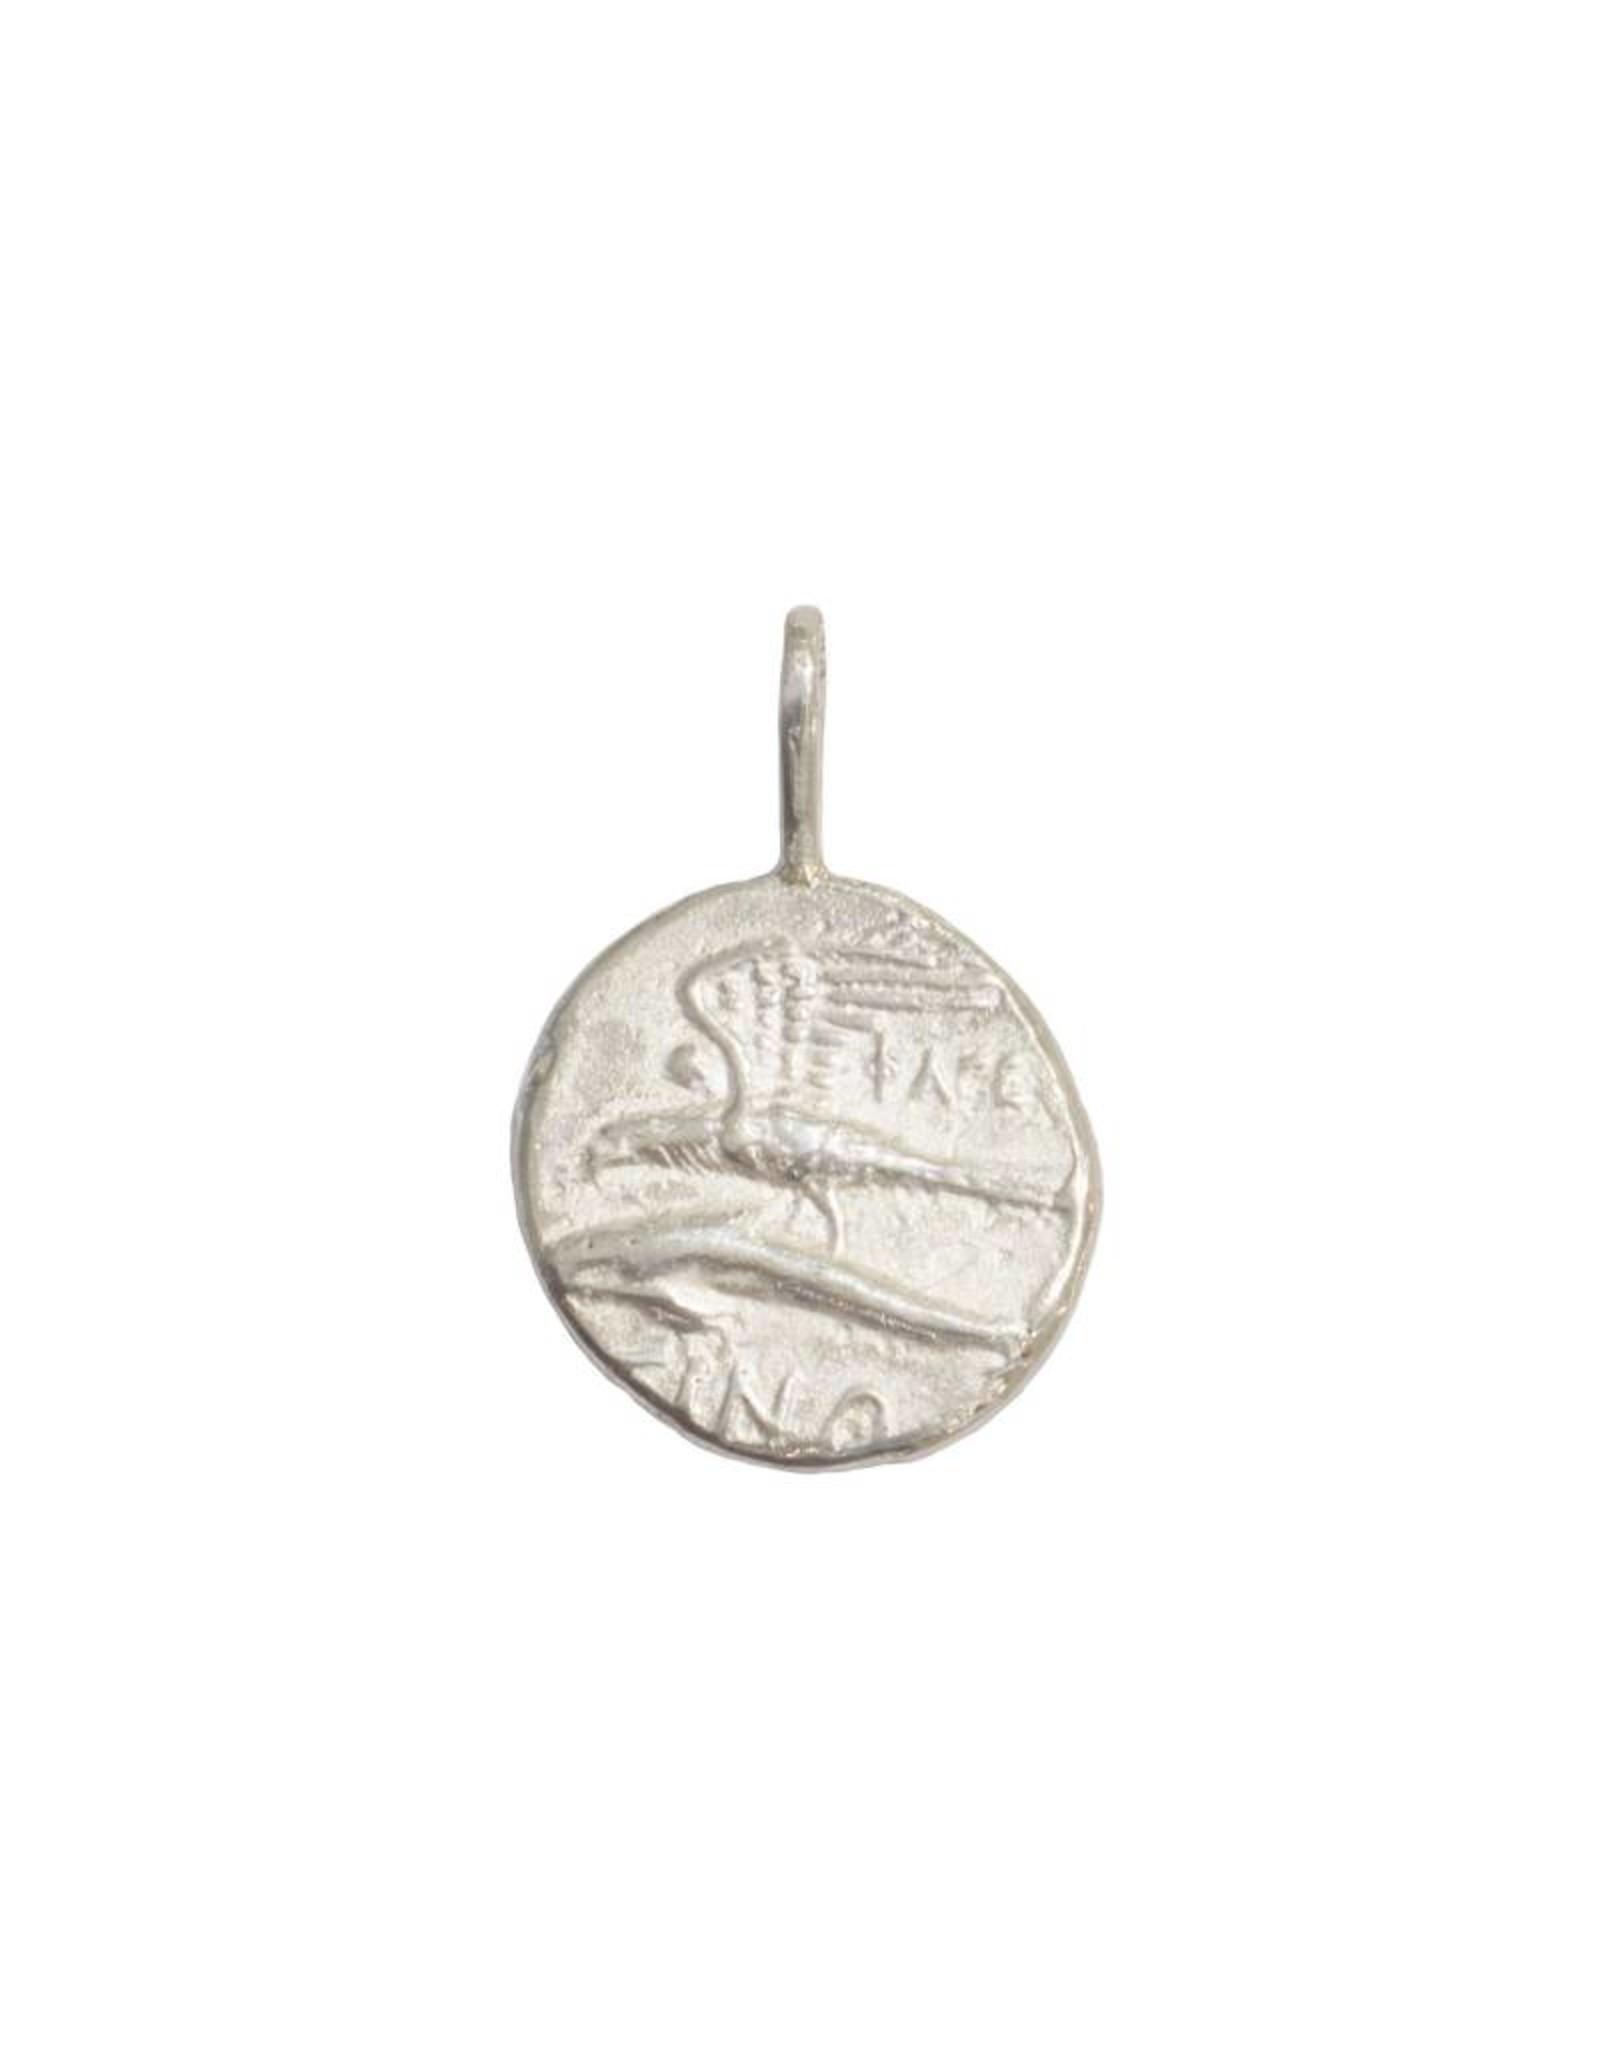 Robin Haley Jewelry Partnership Artifact Necklace